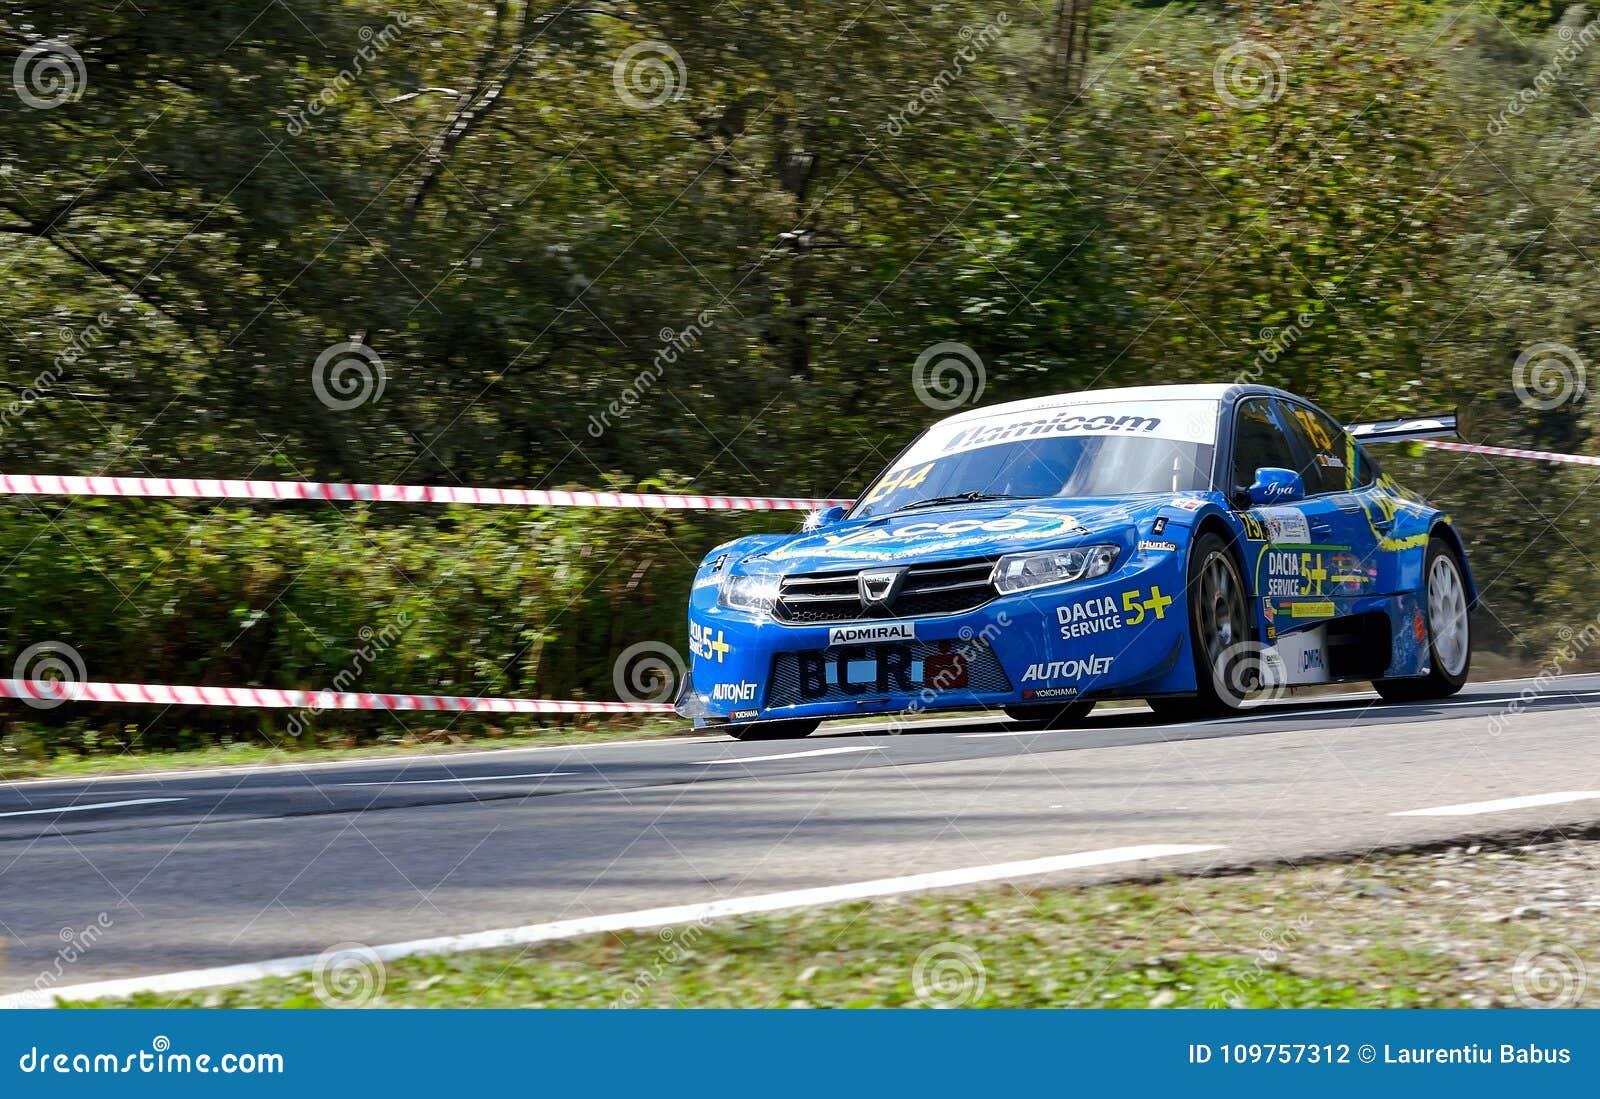 Dacia Logan Tuning Rally Car Editorial Photography - Image